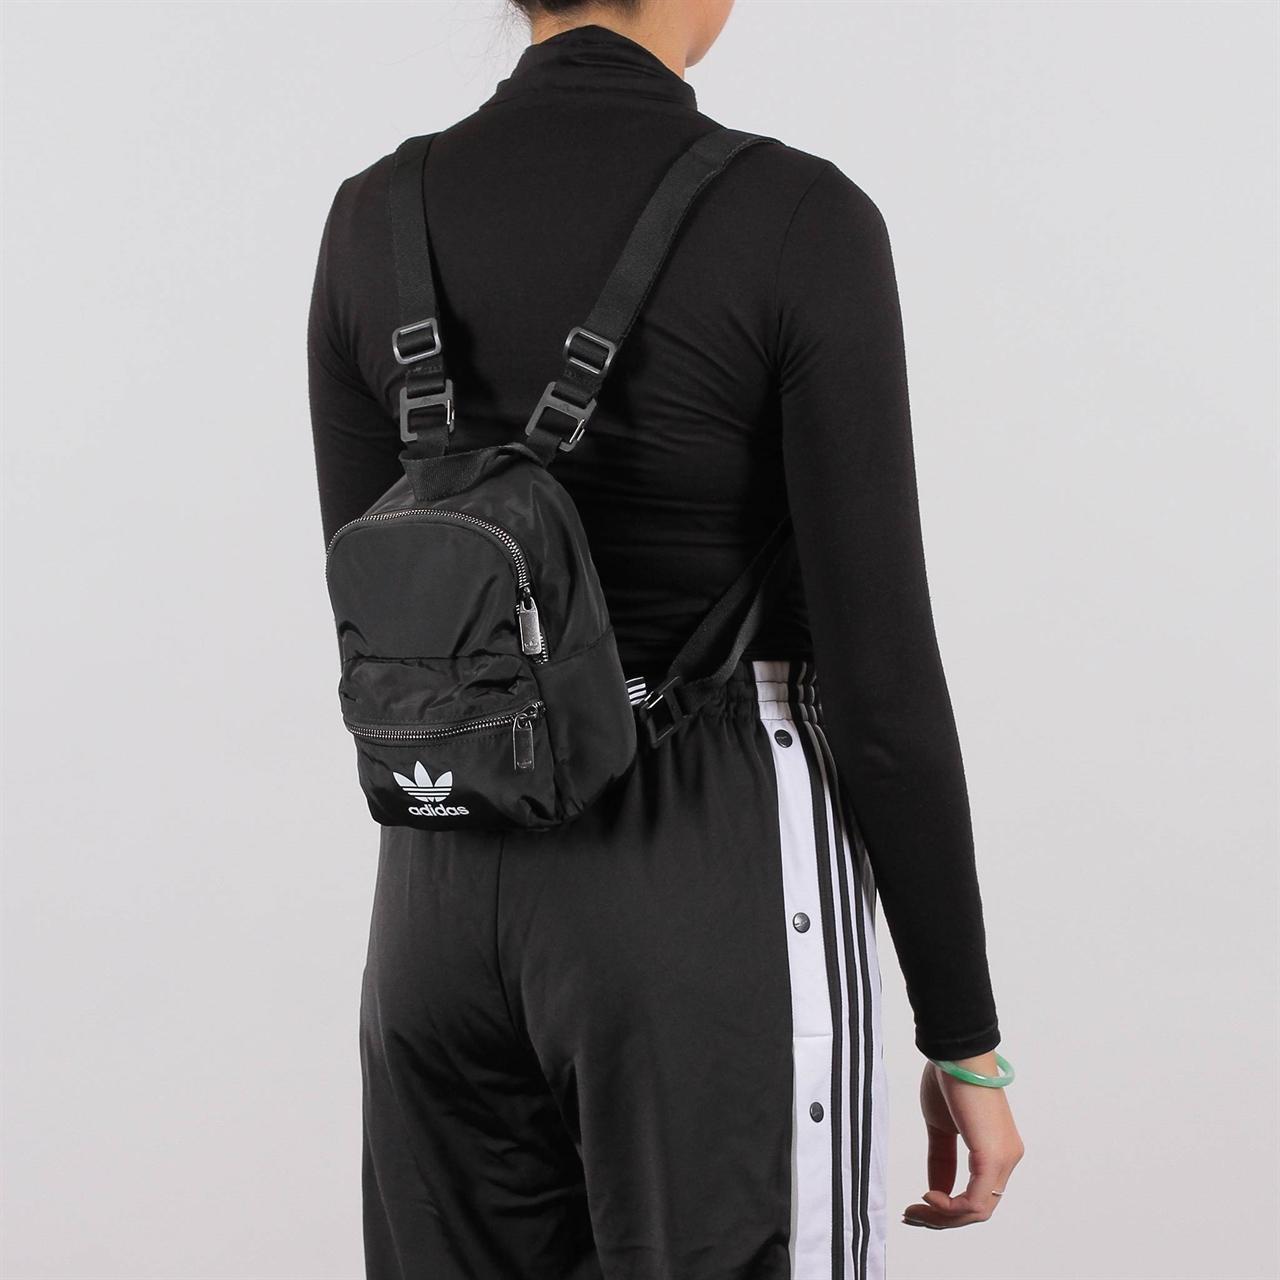 eb0e8cb4bb Shelta - Adidas Originals Backpack Mini Black (ED5869)